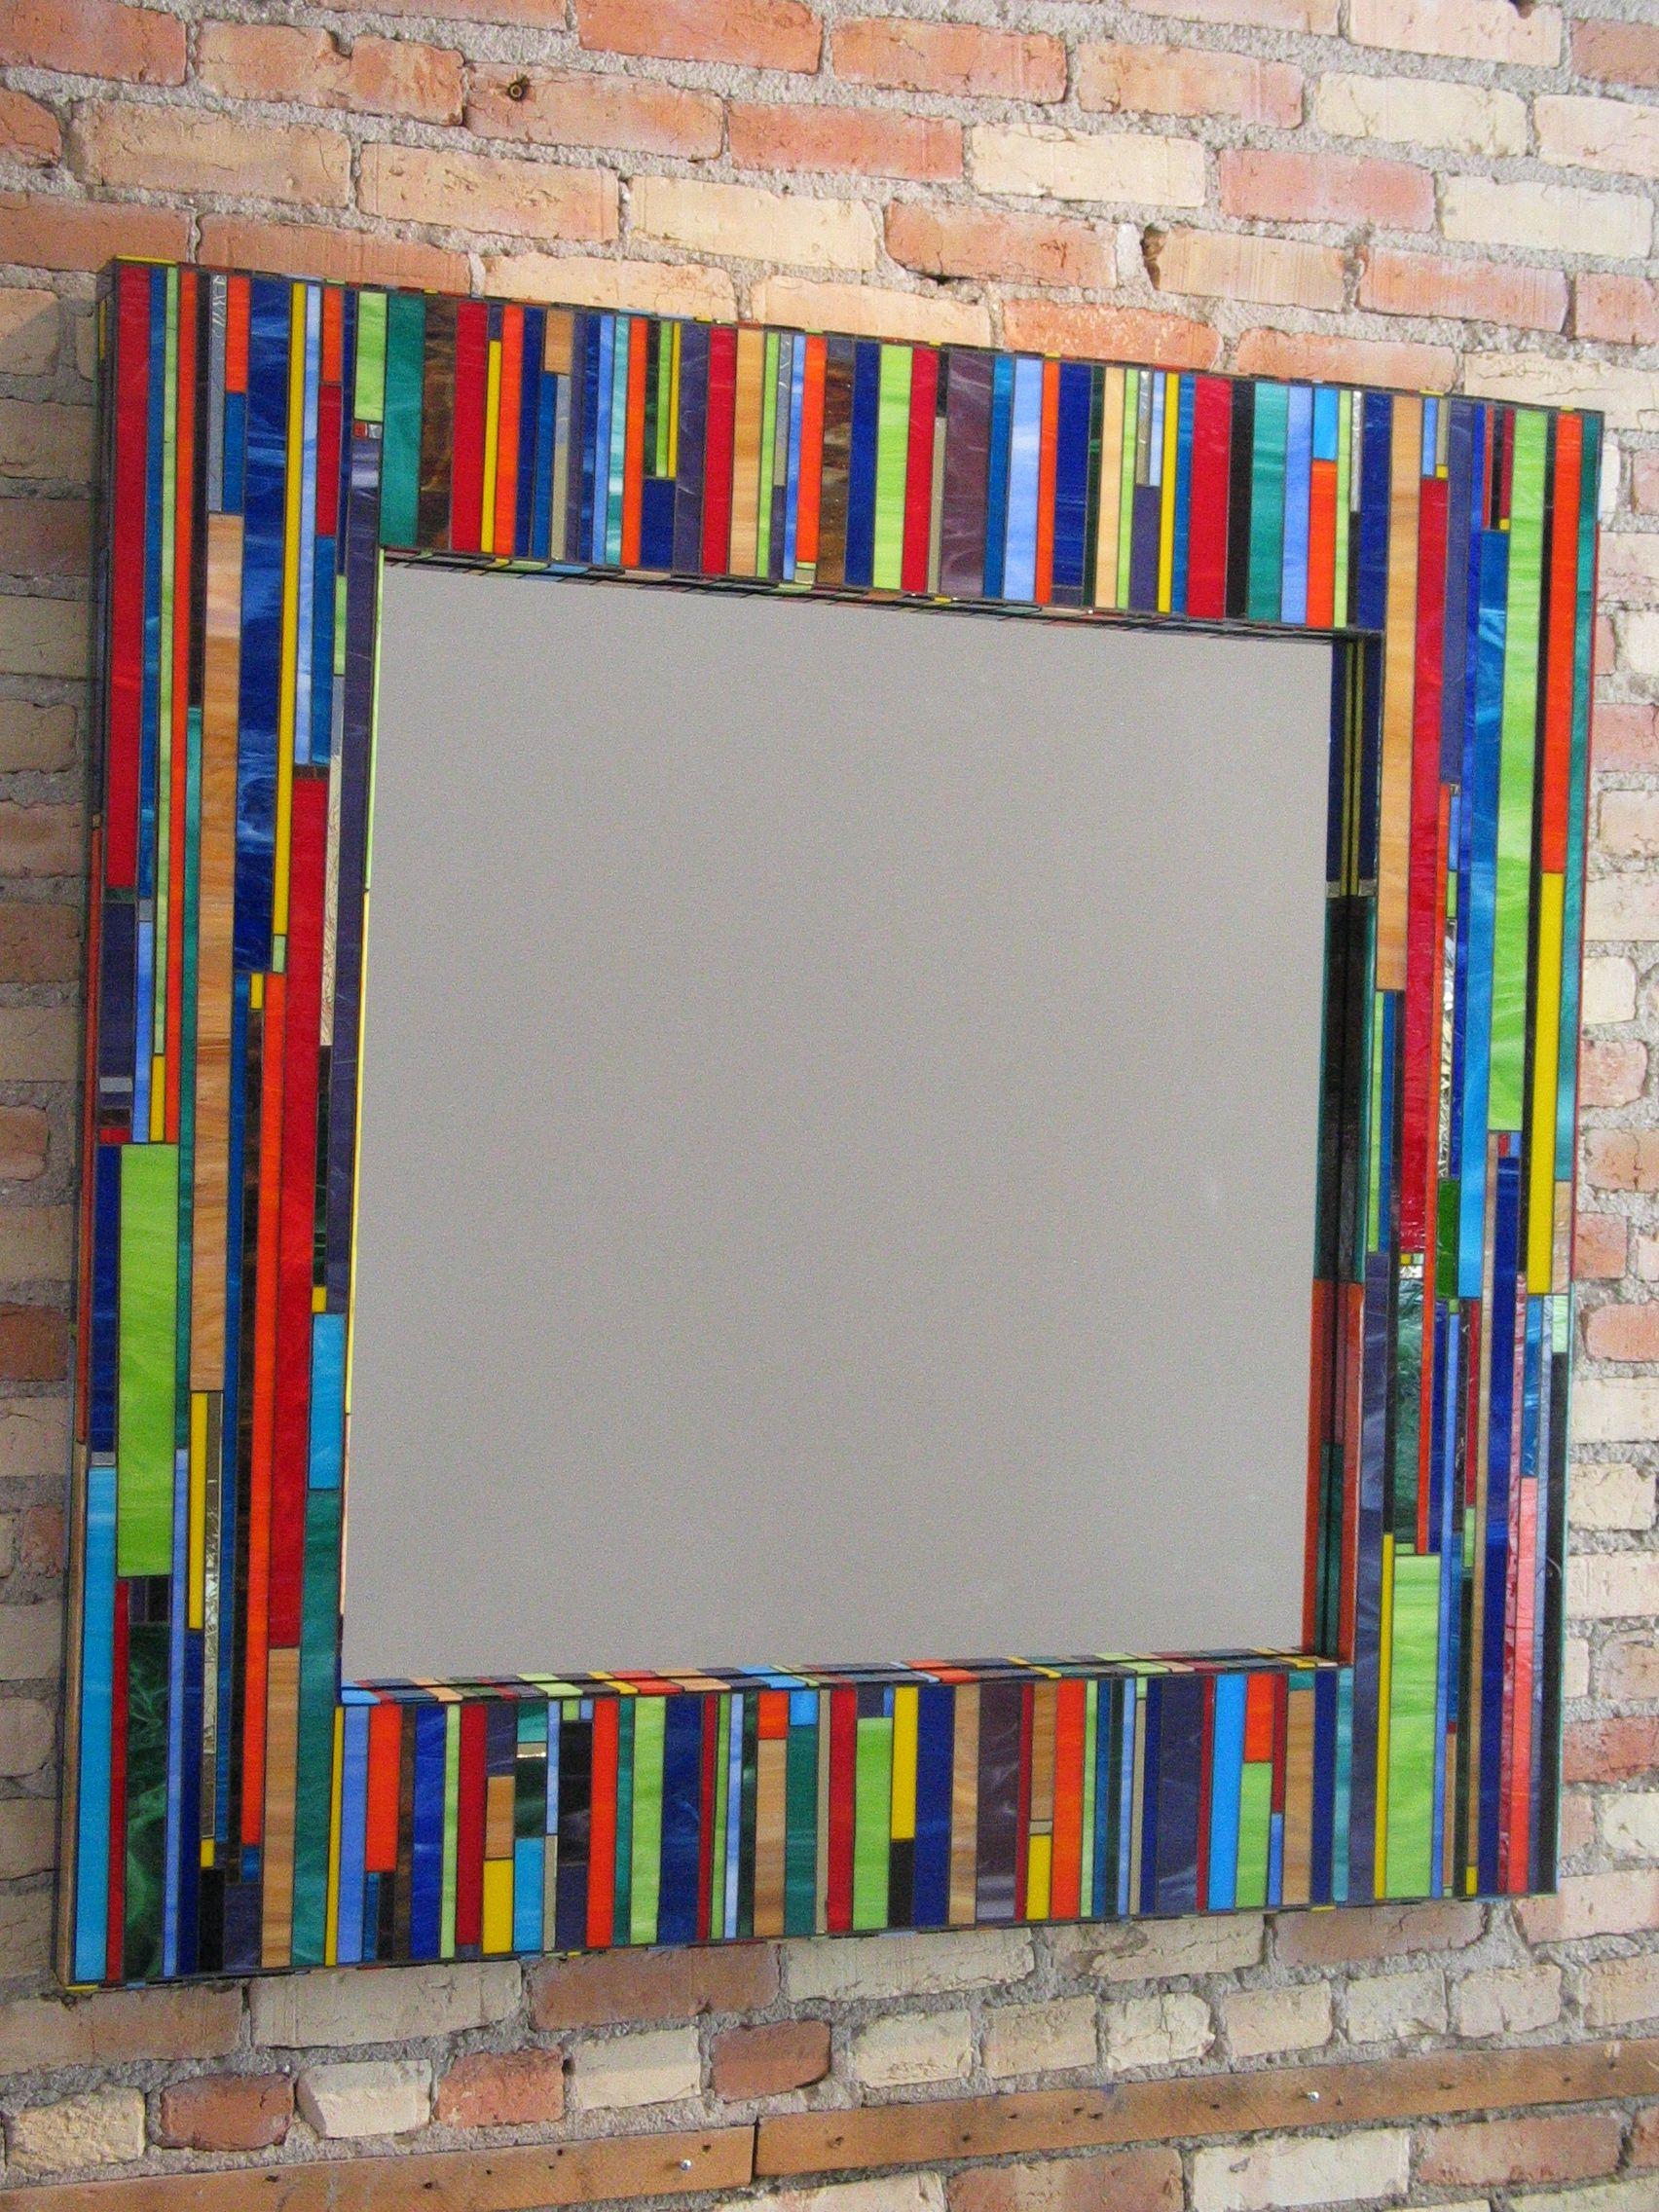 Mosaico espejo. | mosaicos | Pinterest | Mosaicos, Espejo y Vidrio